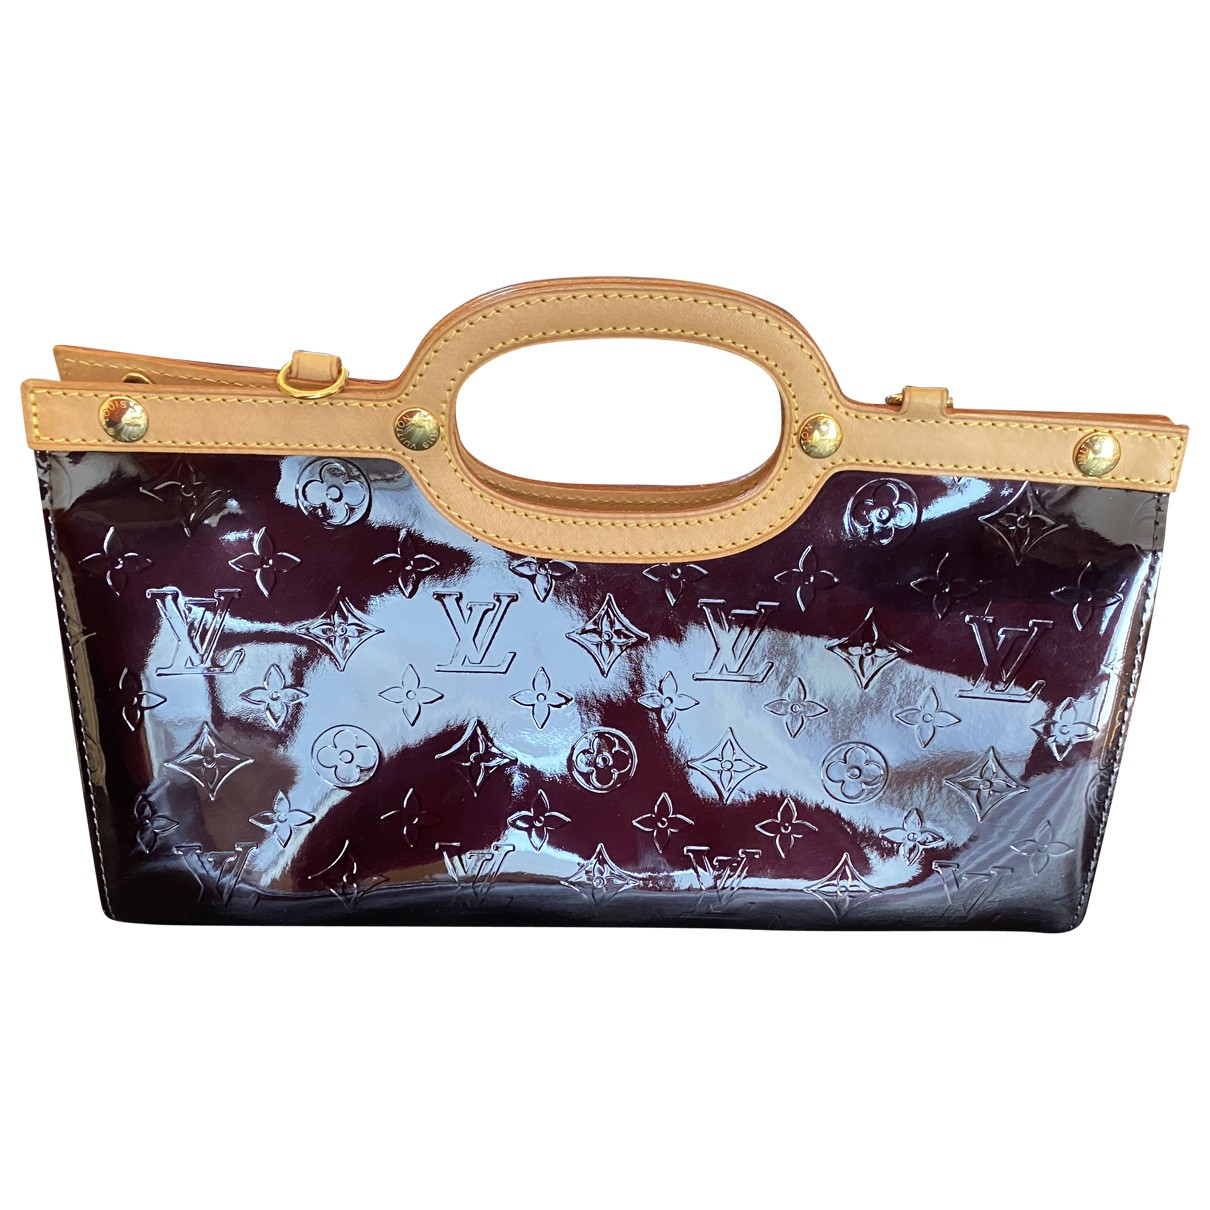 Louis Vuitton Roxbury Burgundy Patent leather handbag for Women \N